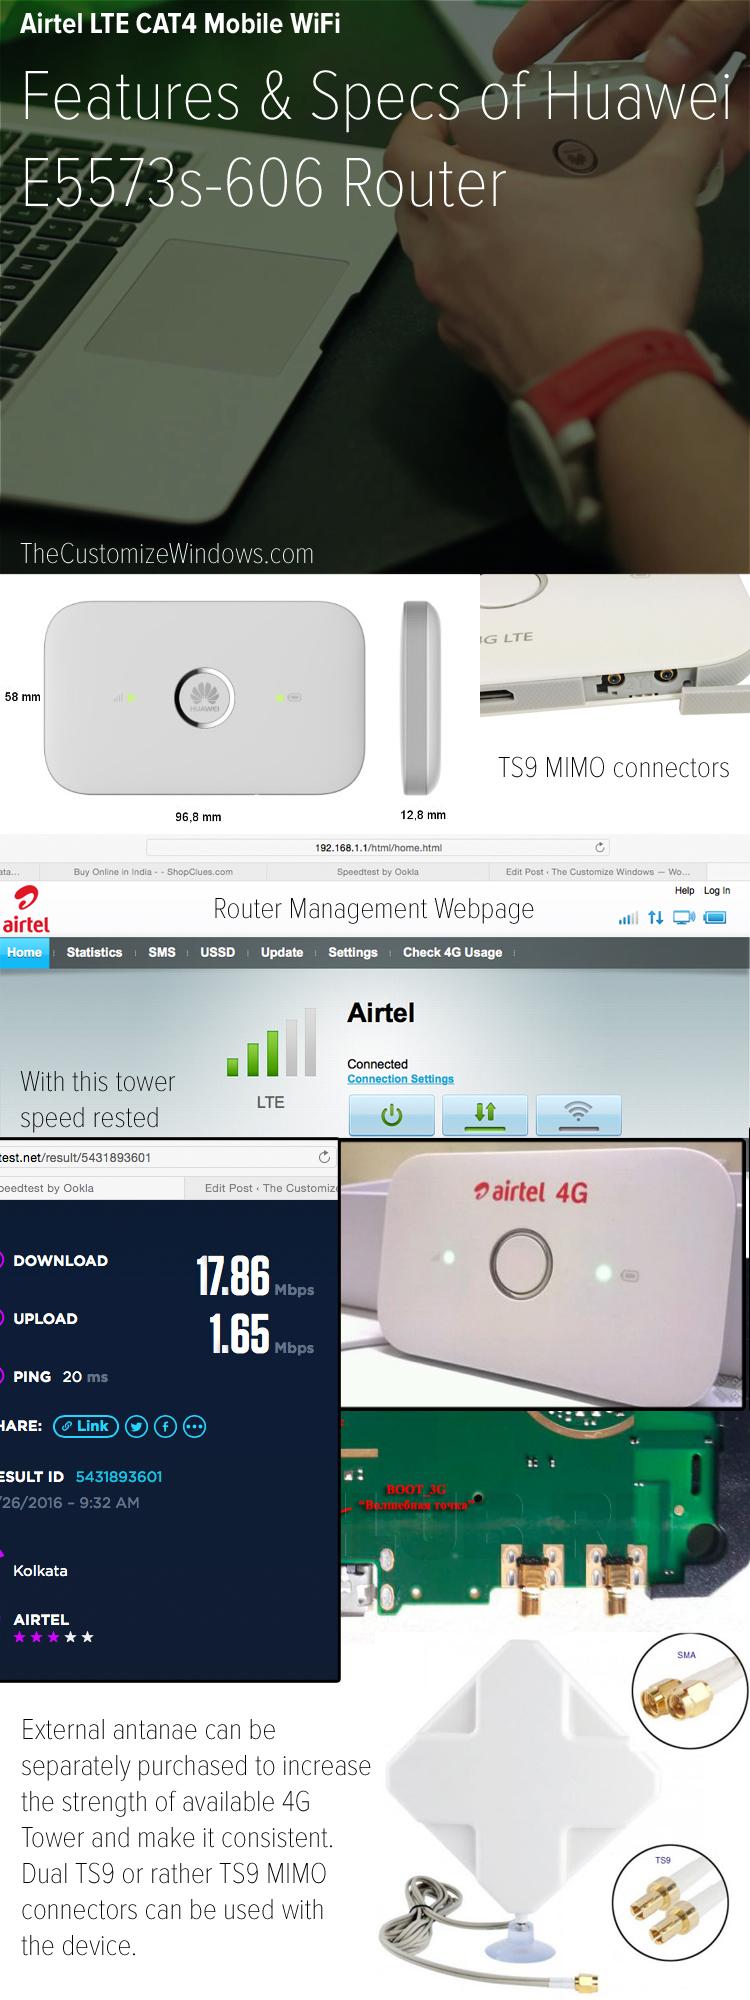 Airtel 4G Huawei E5573 Router WiFi Hotspot